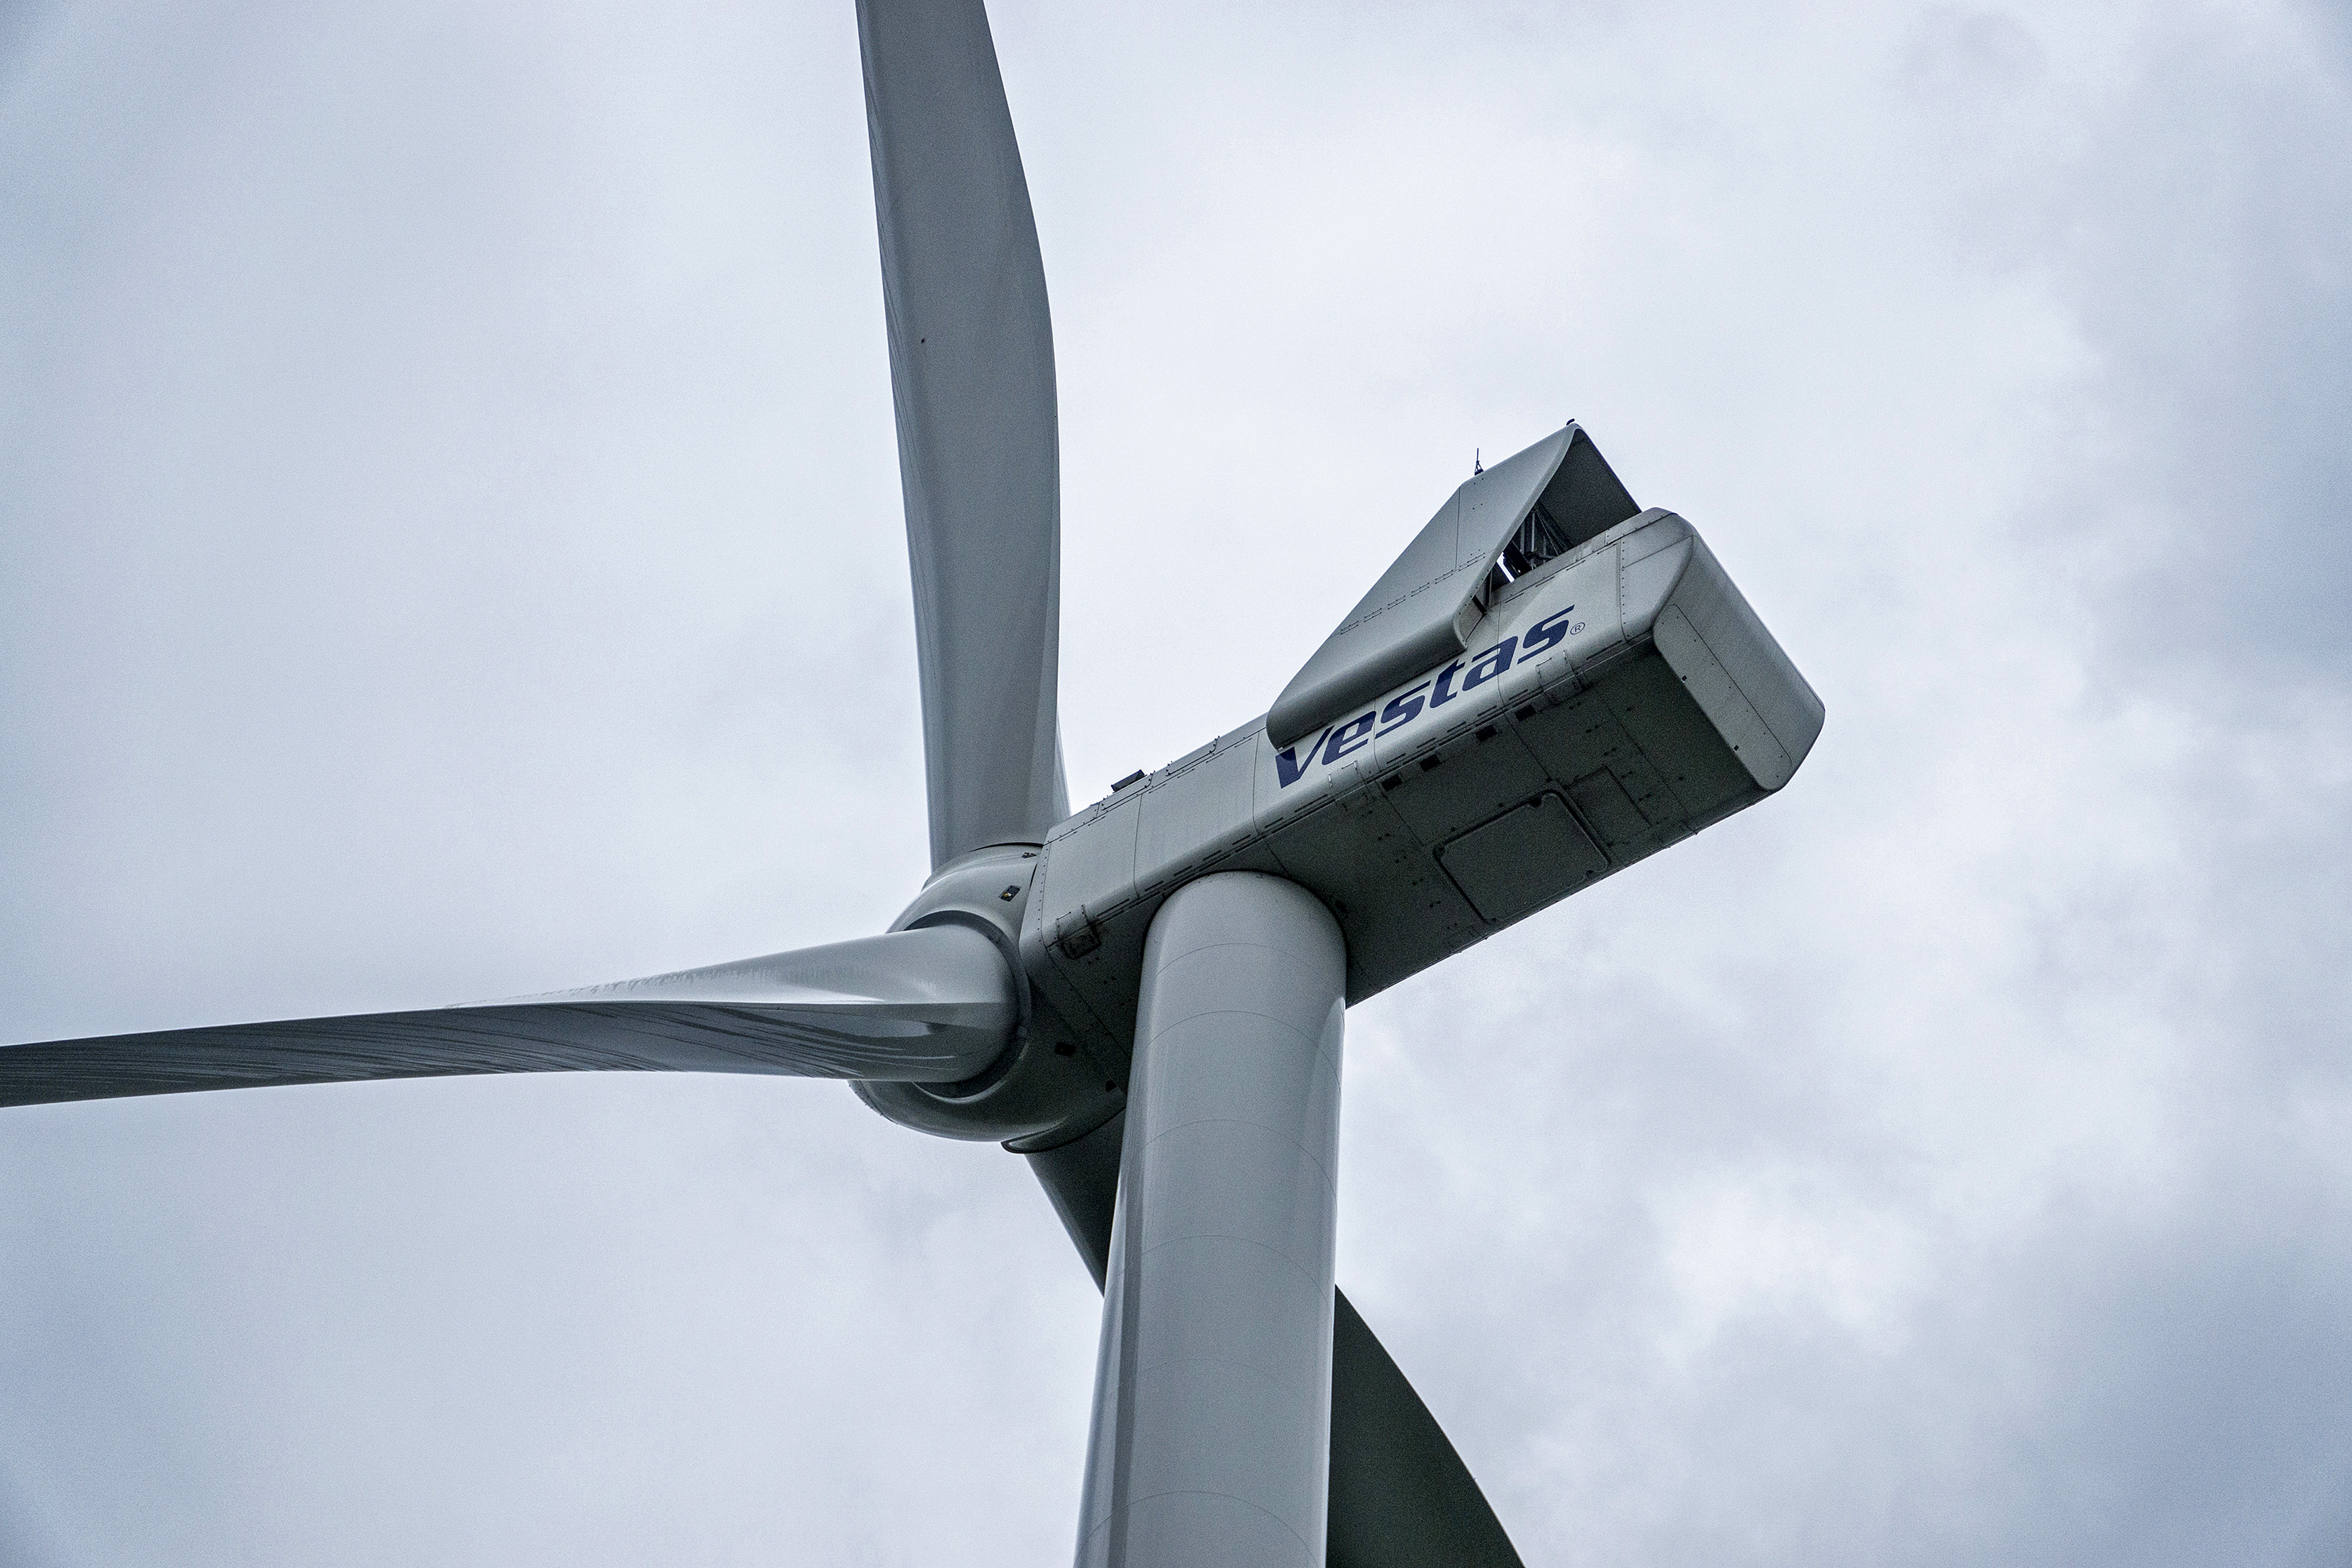 Vestas A/S Wind Turbines Operating At DTEK Holdings Ltd. Wind Farm